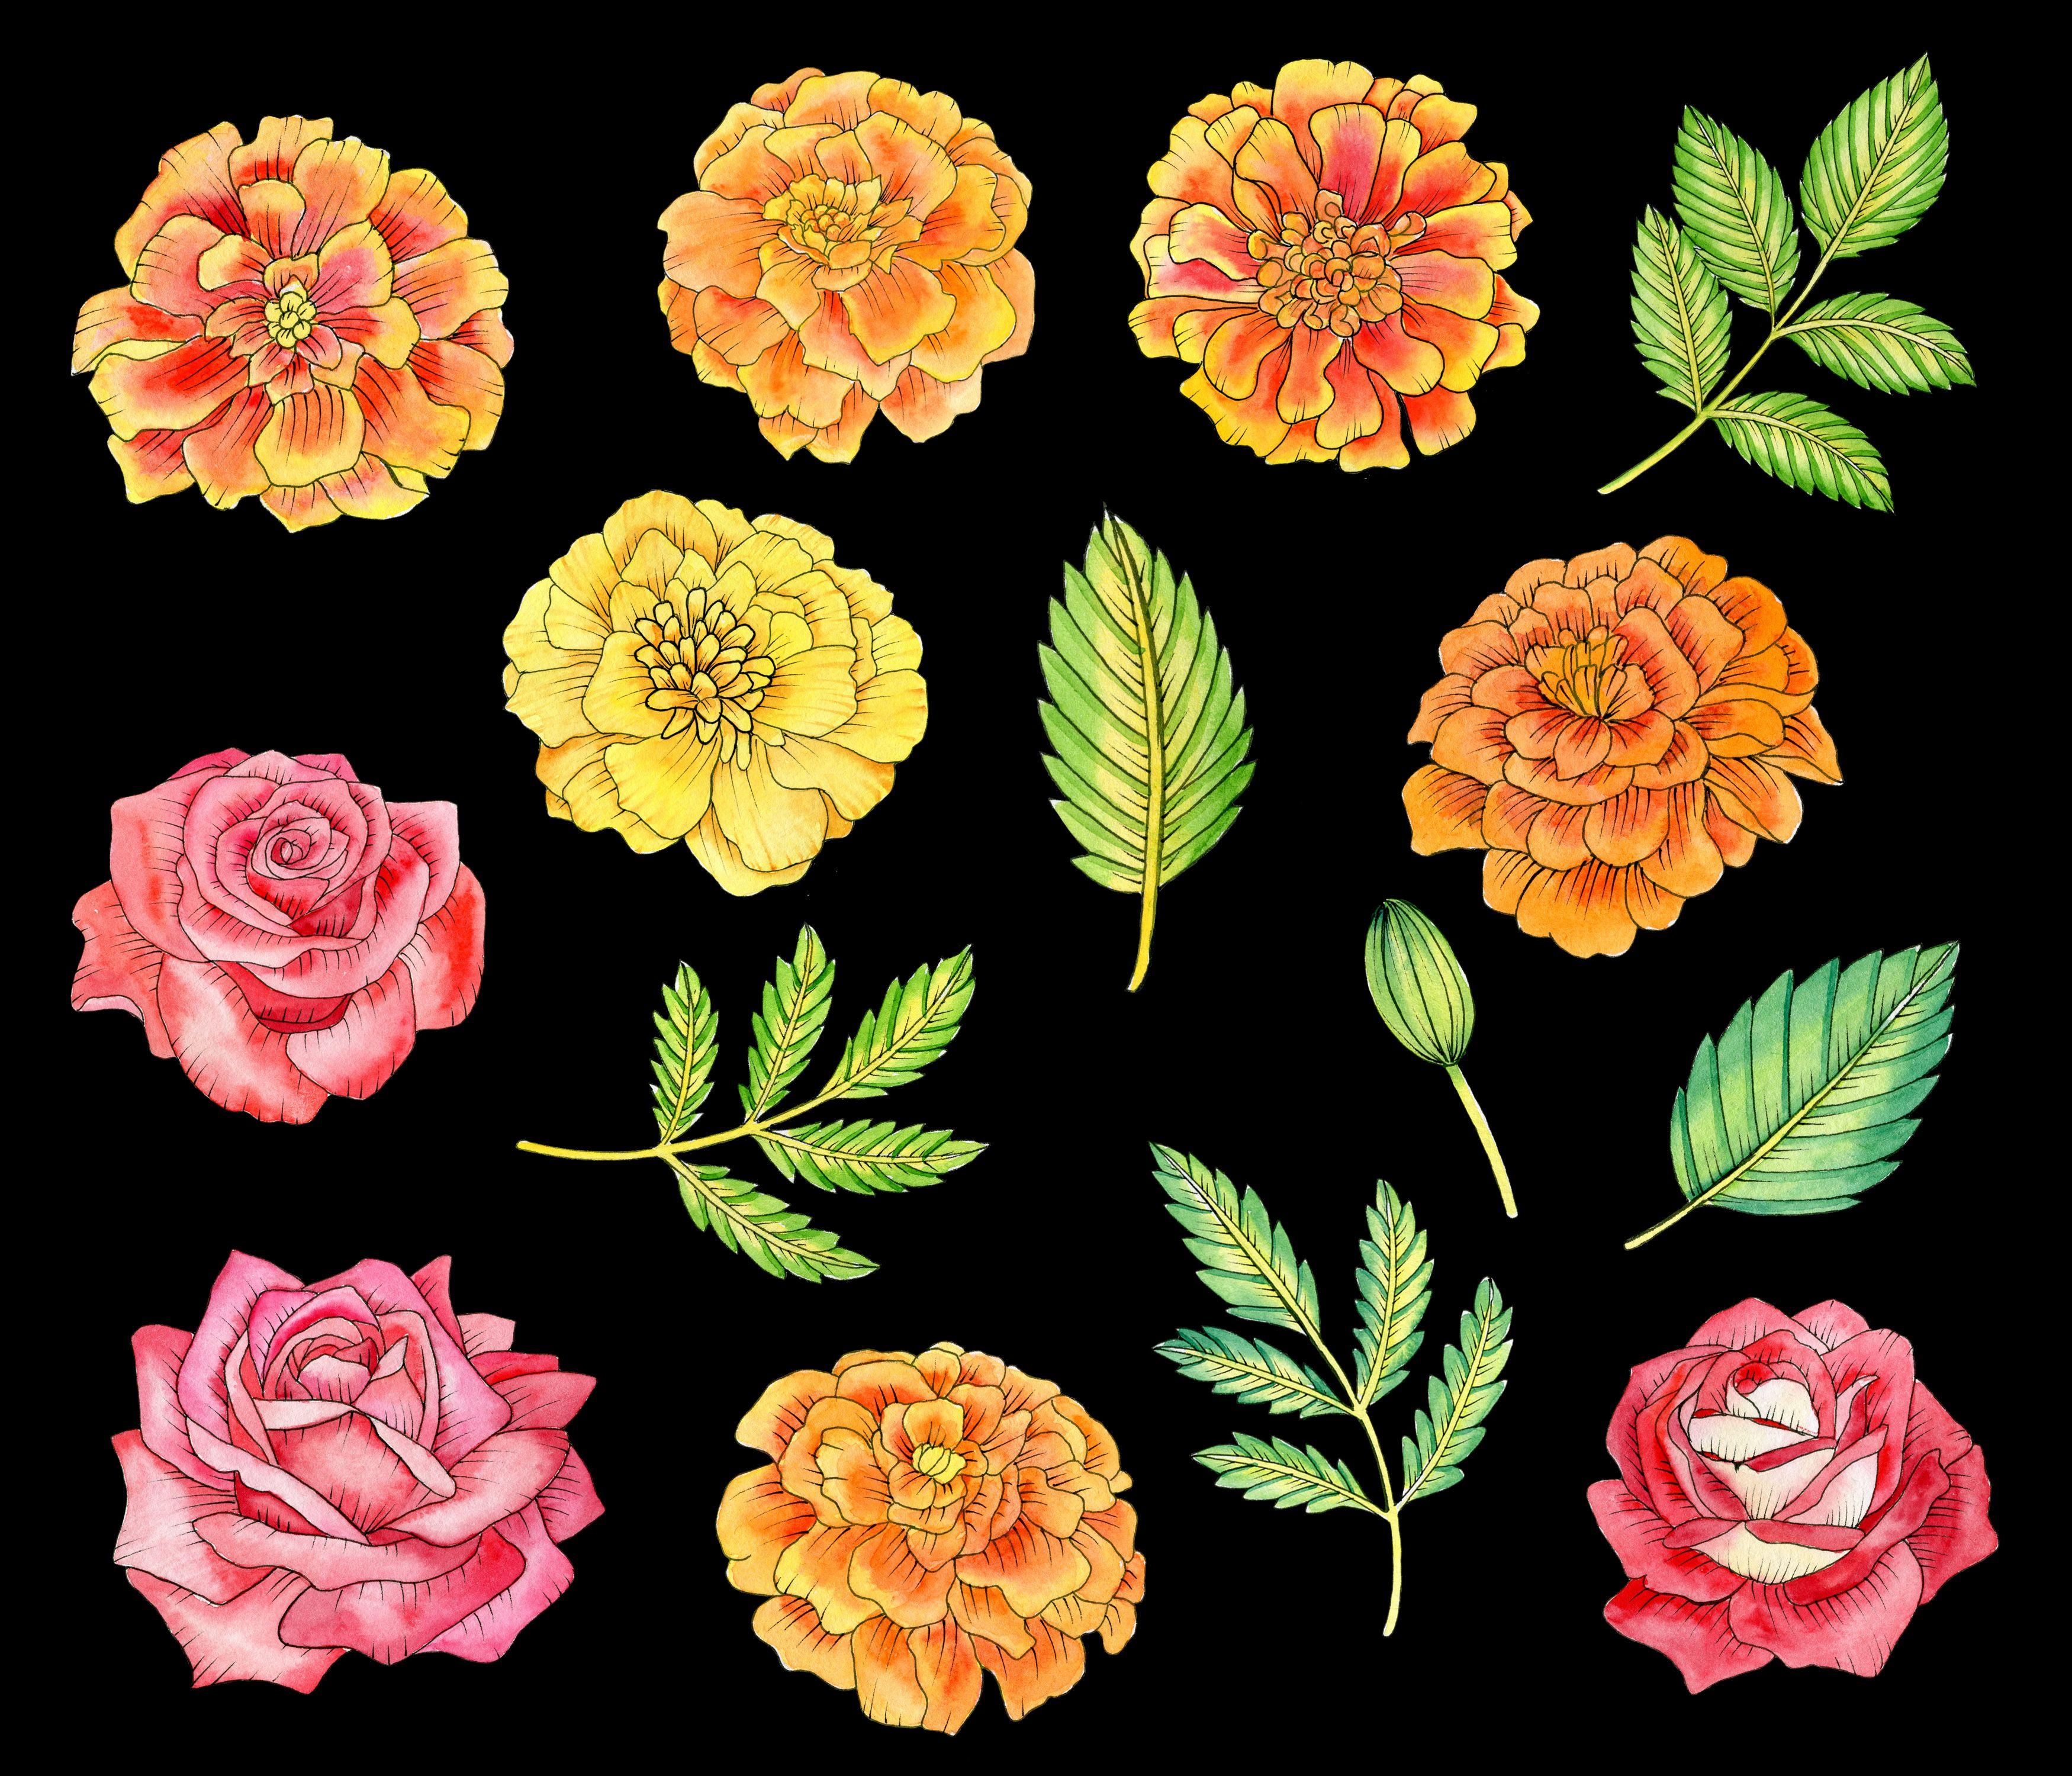 Watercolor Mexican Flowers Clipart El Dia De Muertos Floral Etsy Mexican Flowers Flower Art Flower Aesthetic